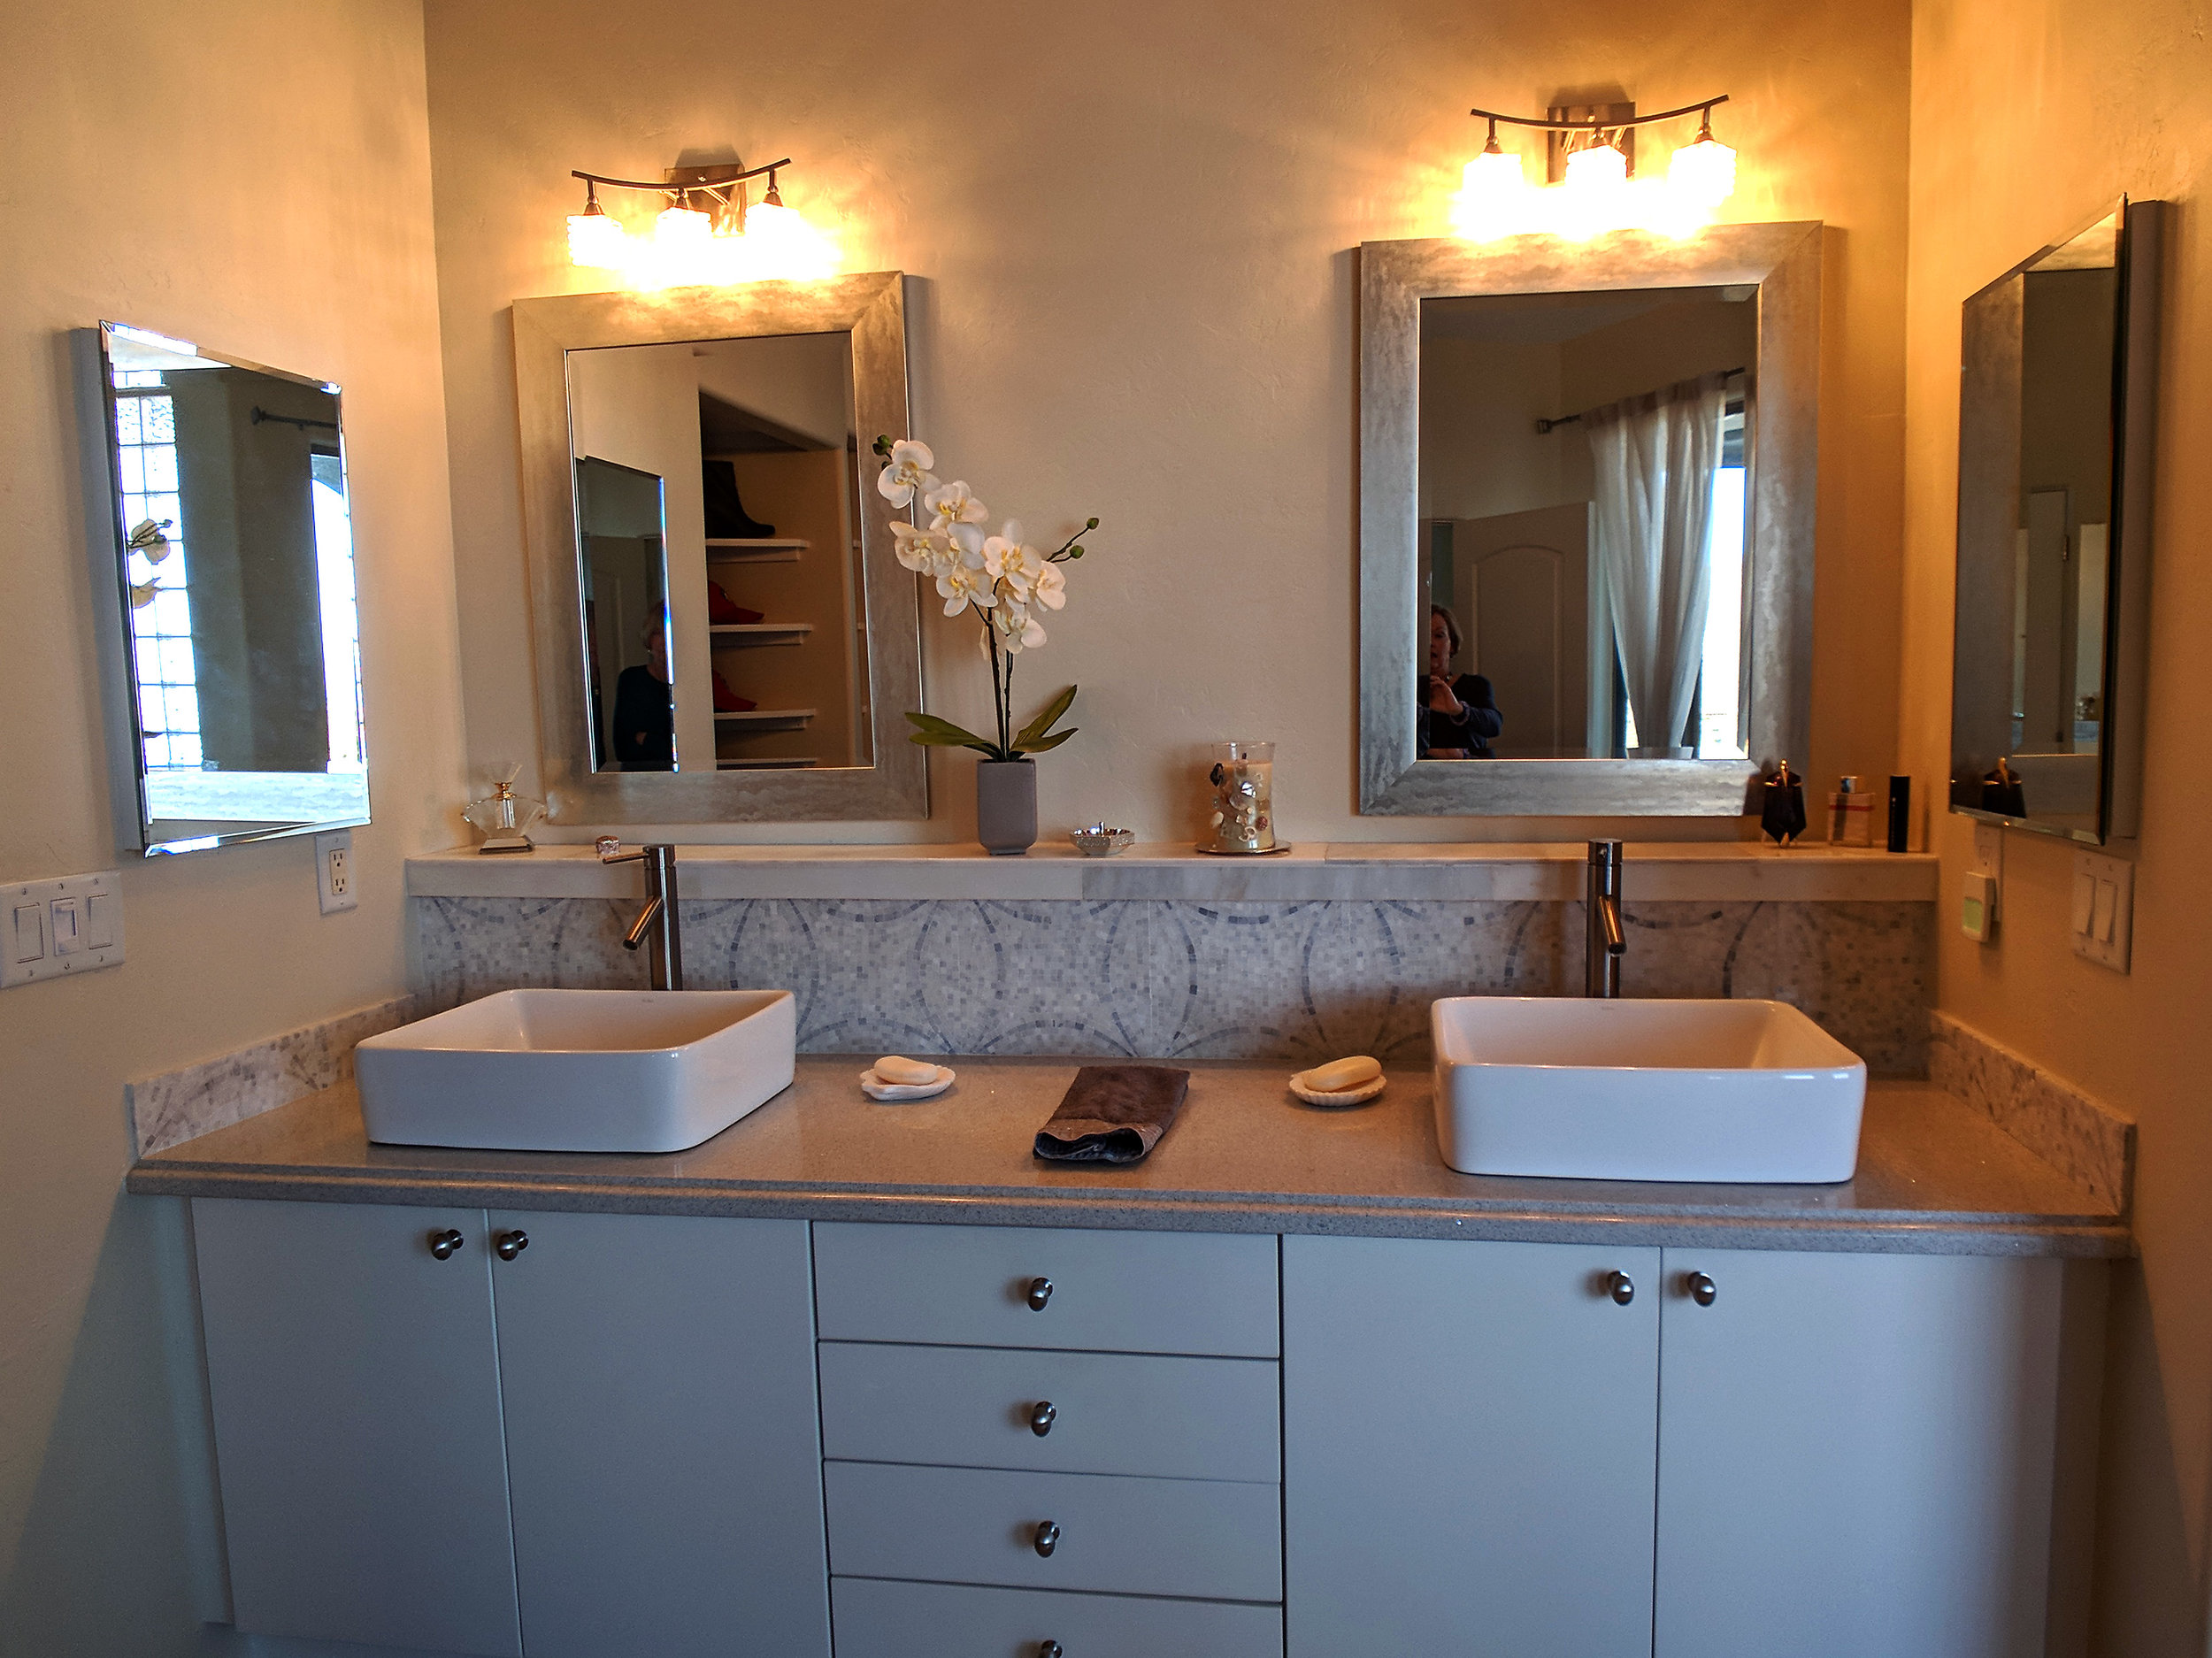 holland-bathroom-vessel-sinks.jpg